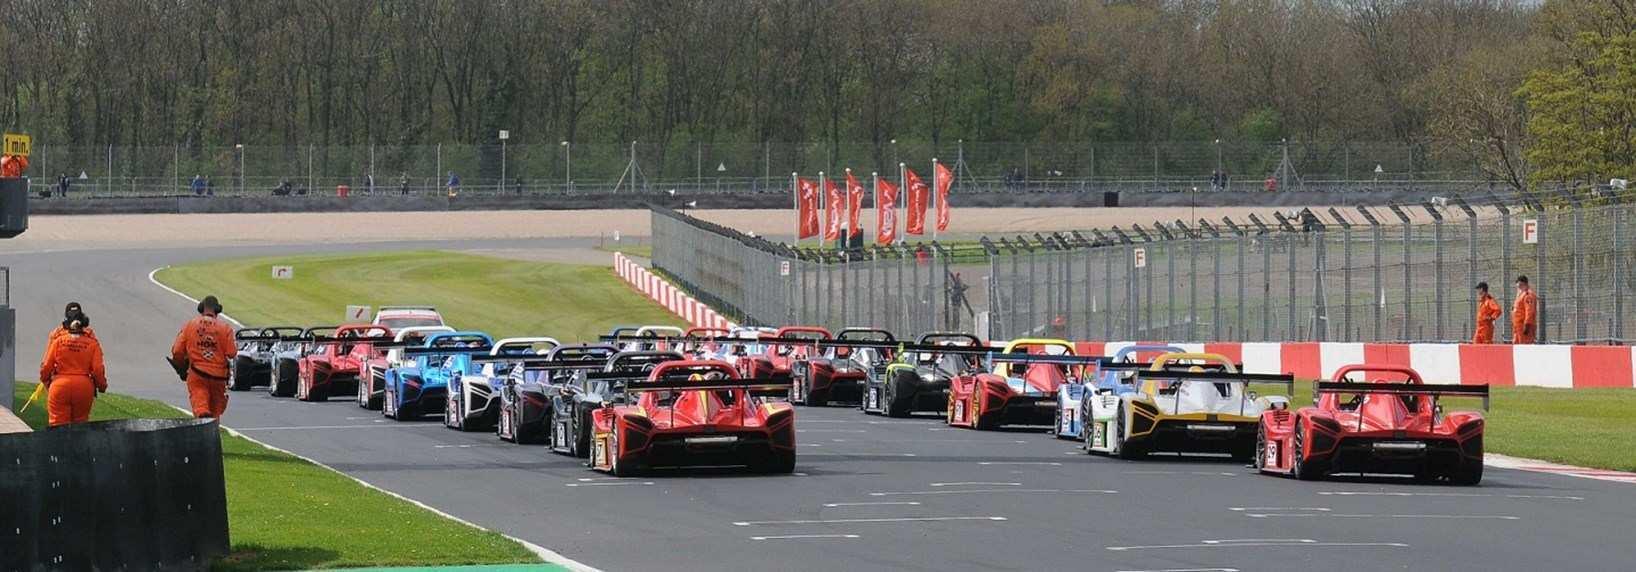 39 New New Ferrari Challenge 2019 Calendar Price Specs for New Ferrari Challenge 2019 Calendar Price